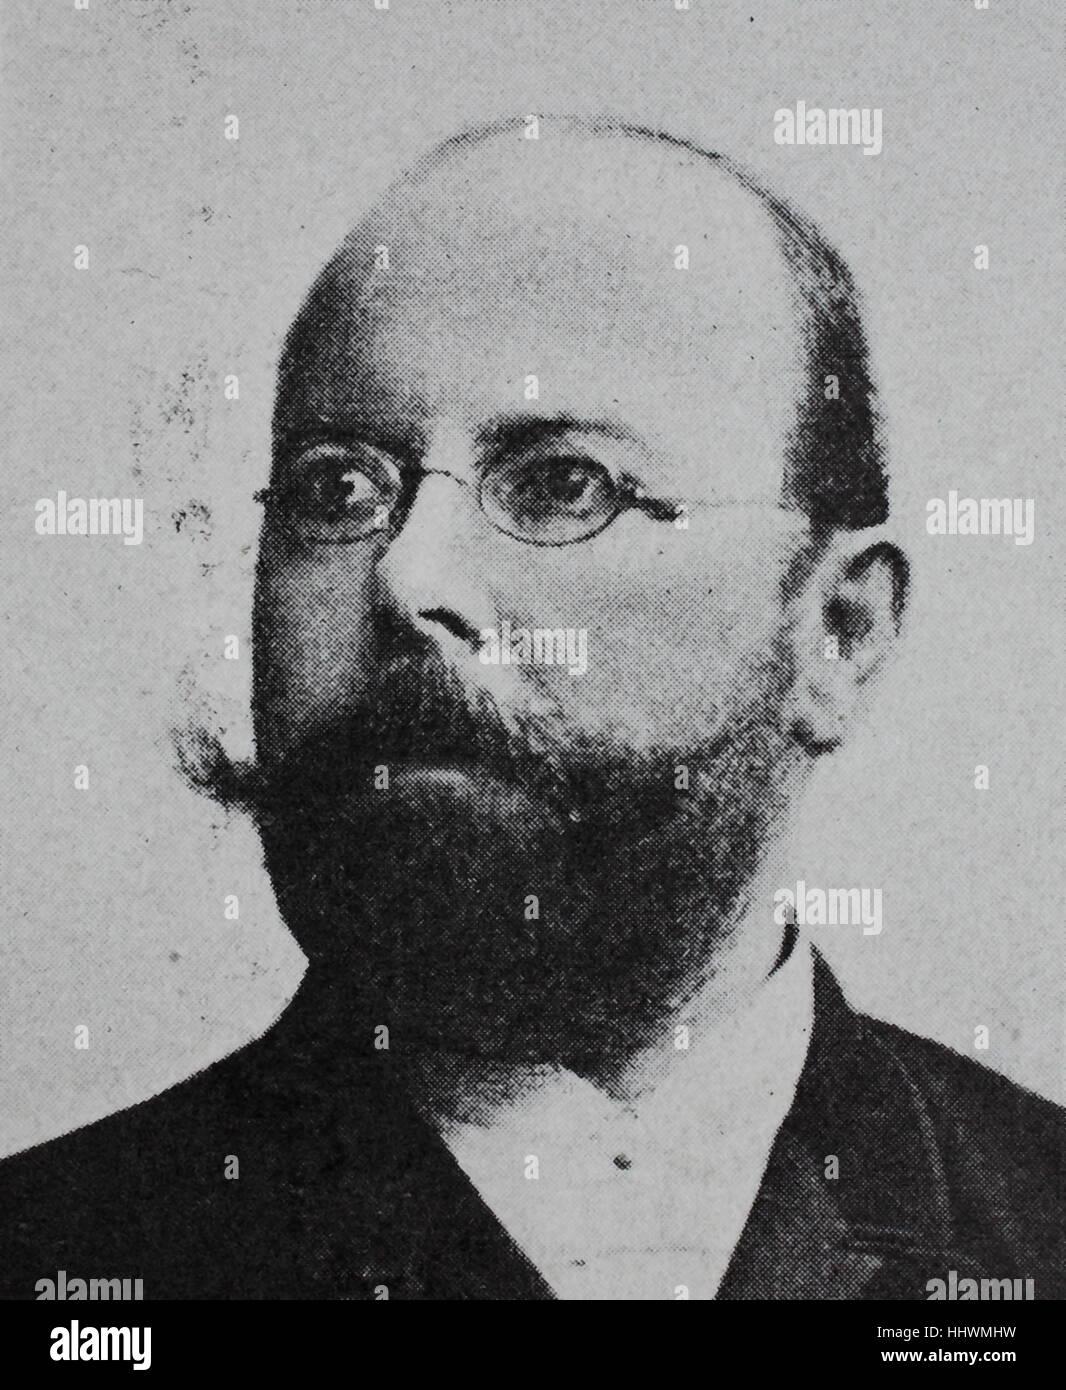 Friedrich August Johannes Loeffler, 1852 - 1915, German bacteriologist, historical image or illustration, published Stock Photo